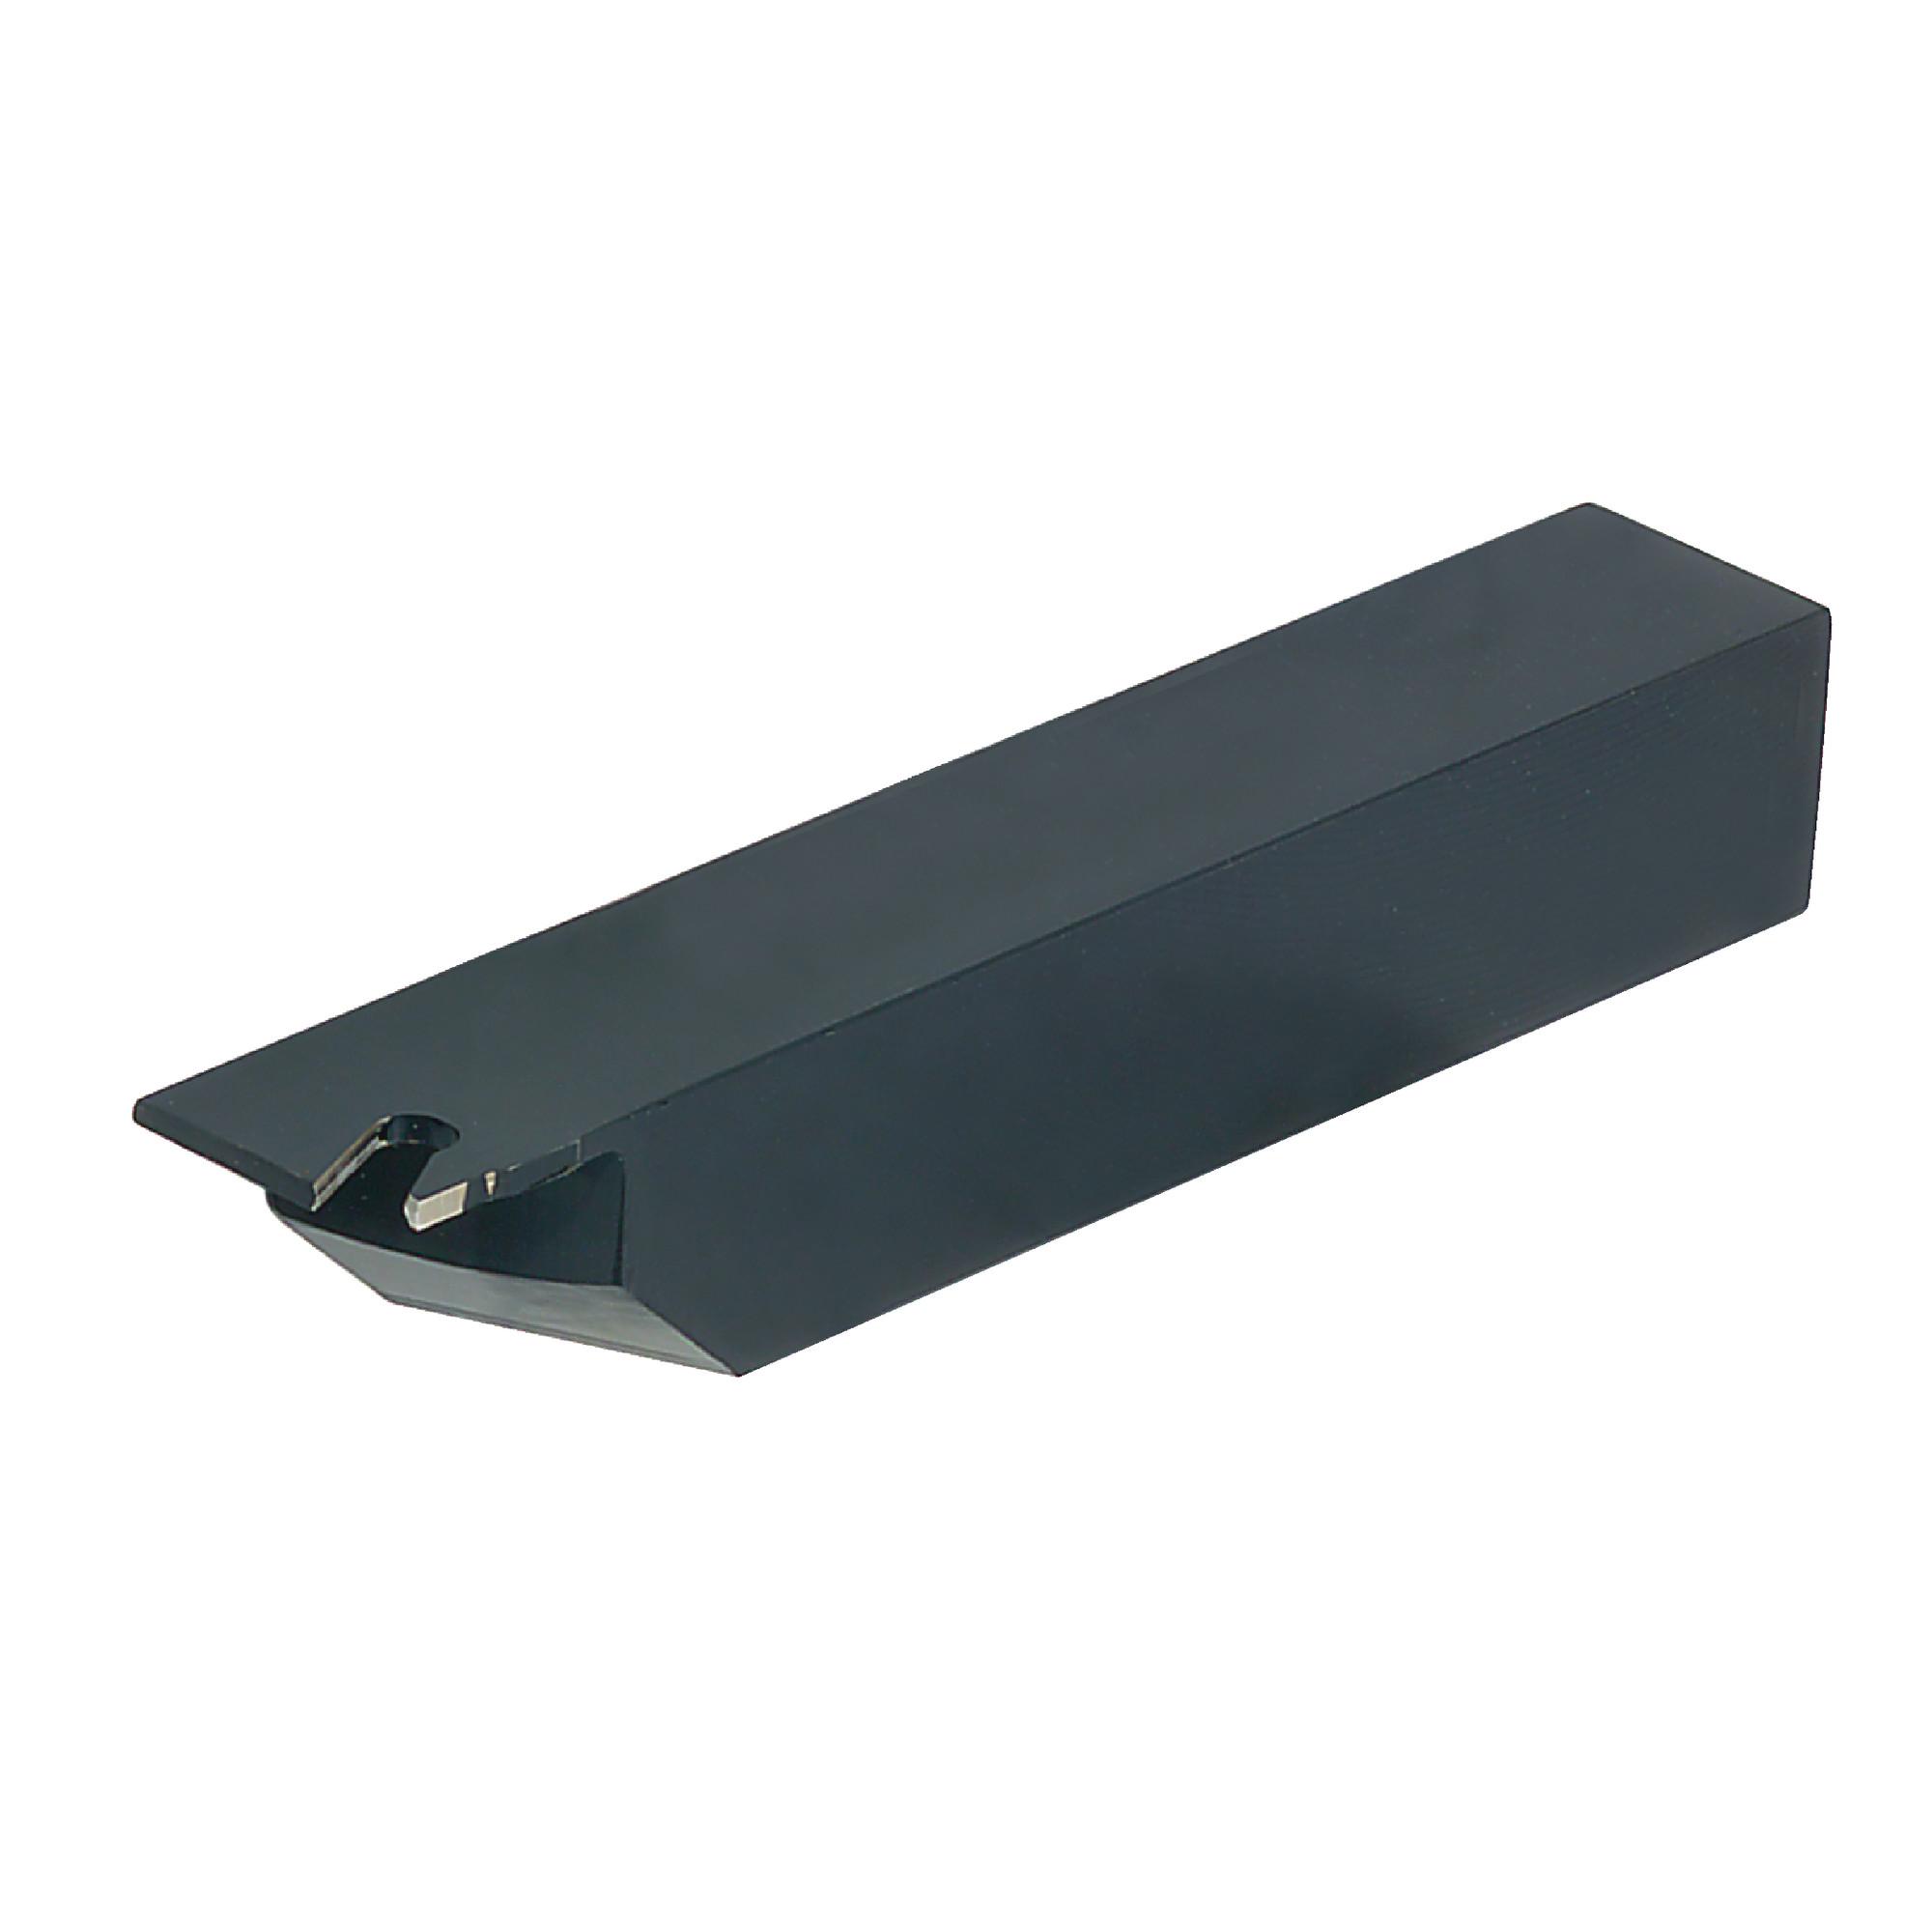 "ISCAR - SGTFL 12.7-2 / 0.500"" Shank / External Monoblock Holder for Grooving & Parting / GFN 2 & GFN 2.4 Self-Grip Inser"